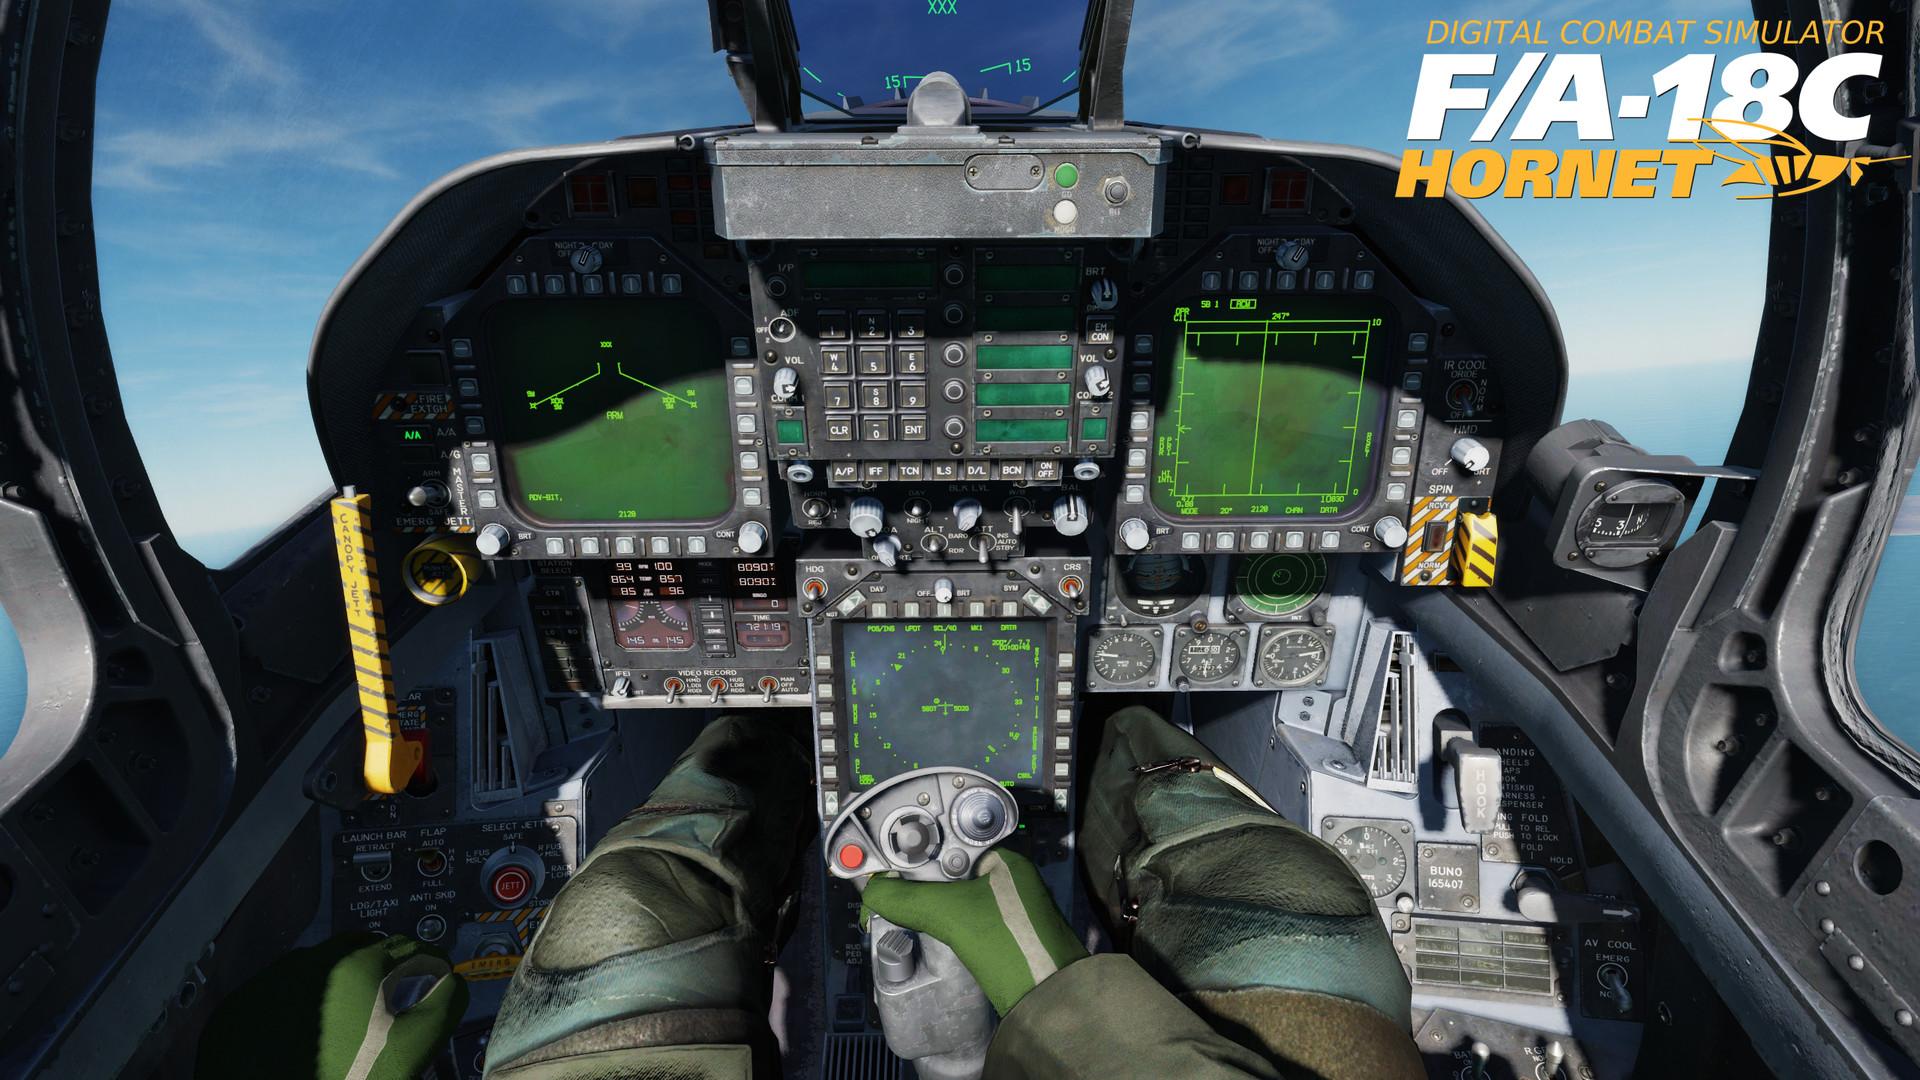 DCS: F/A-18C Hornet Fiyat Karşılaştırma